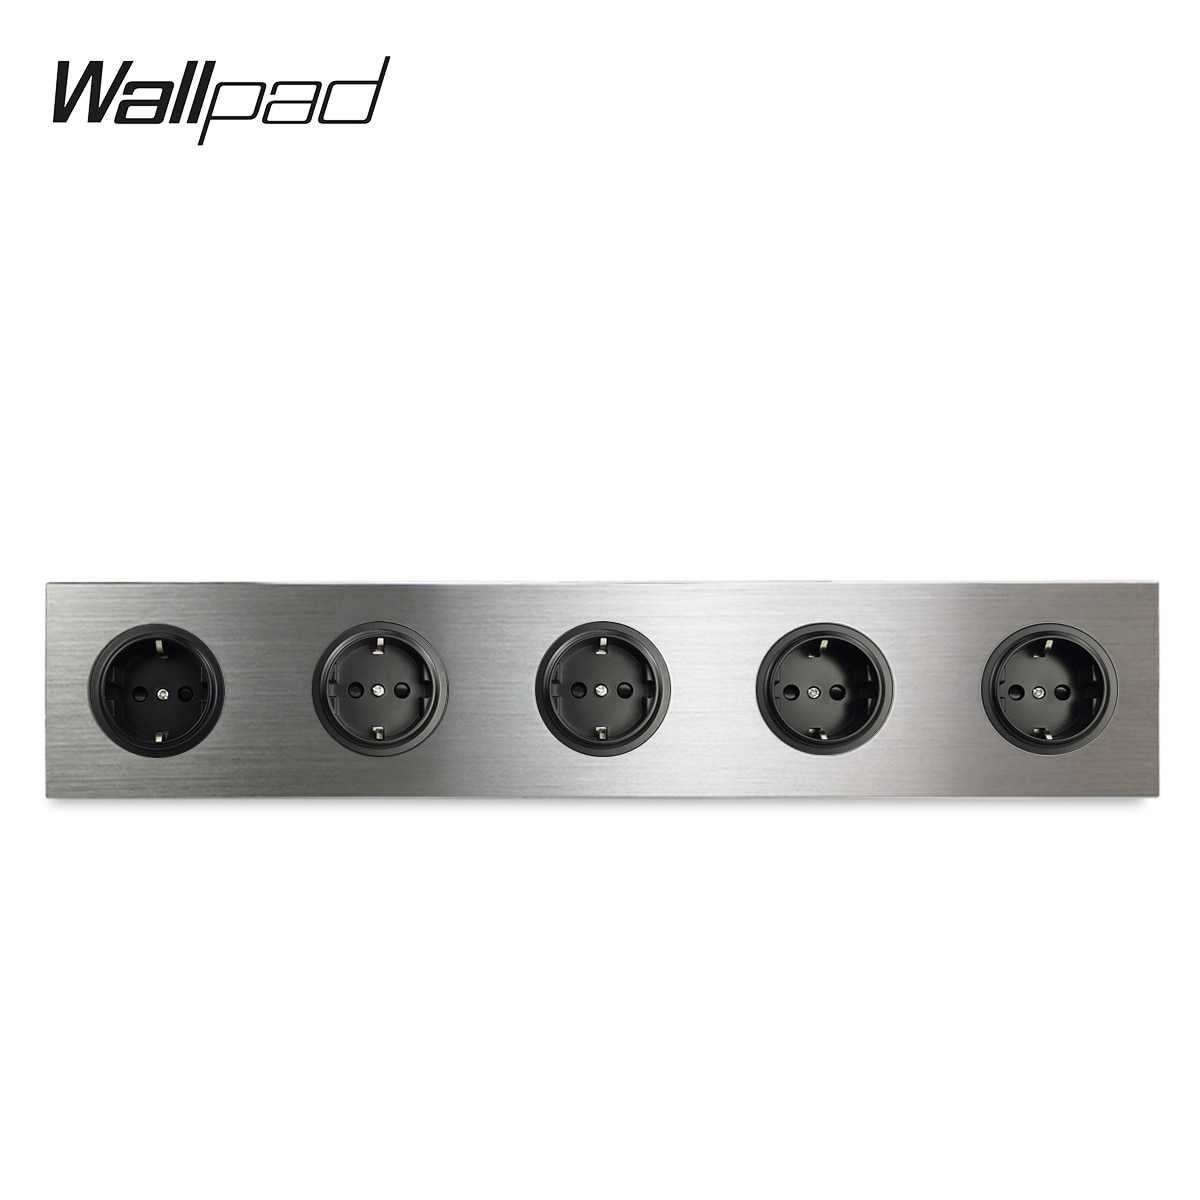 Wallpad-مقبس حائط مزود بـ 5 عصابات ، الاتحاد الأوروبي ، مقبس كهربائي ، ساتان فضي ، لوح من سبائك الألومنيوم المصقول ، 430 × 86 مم